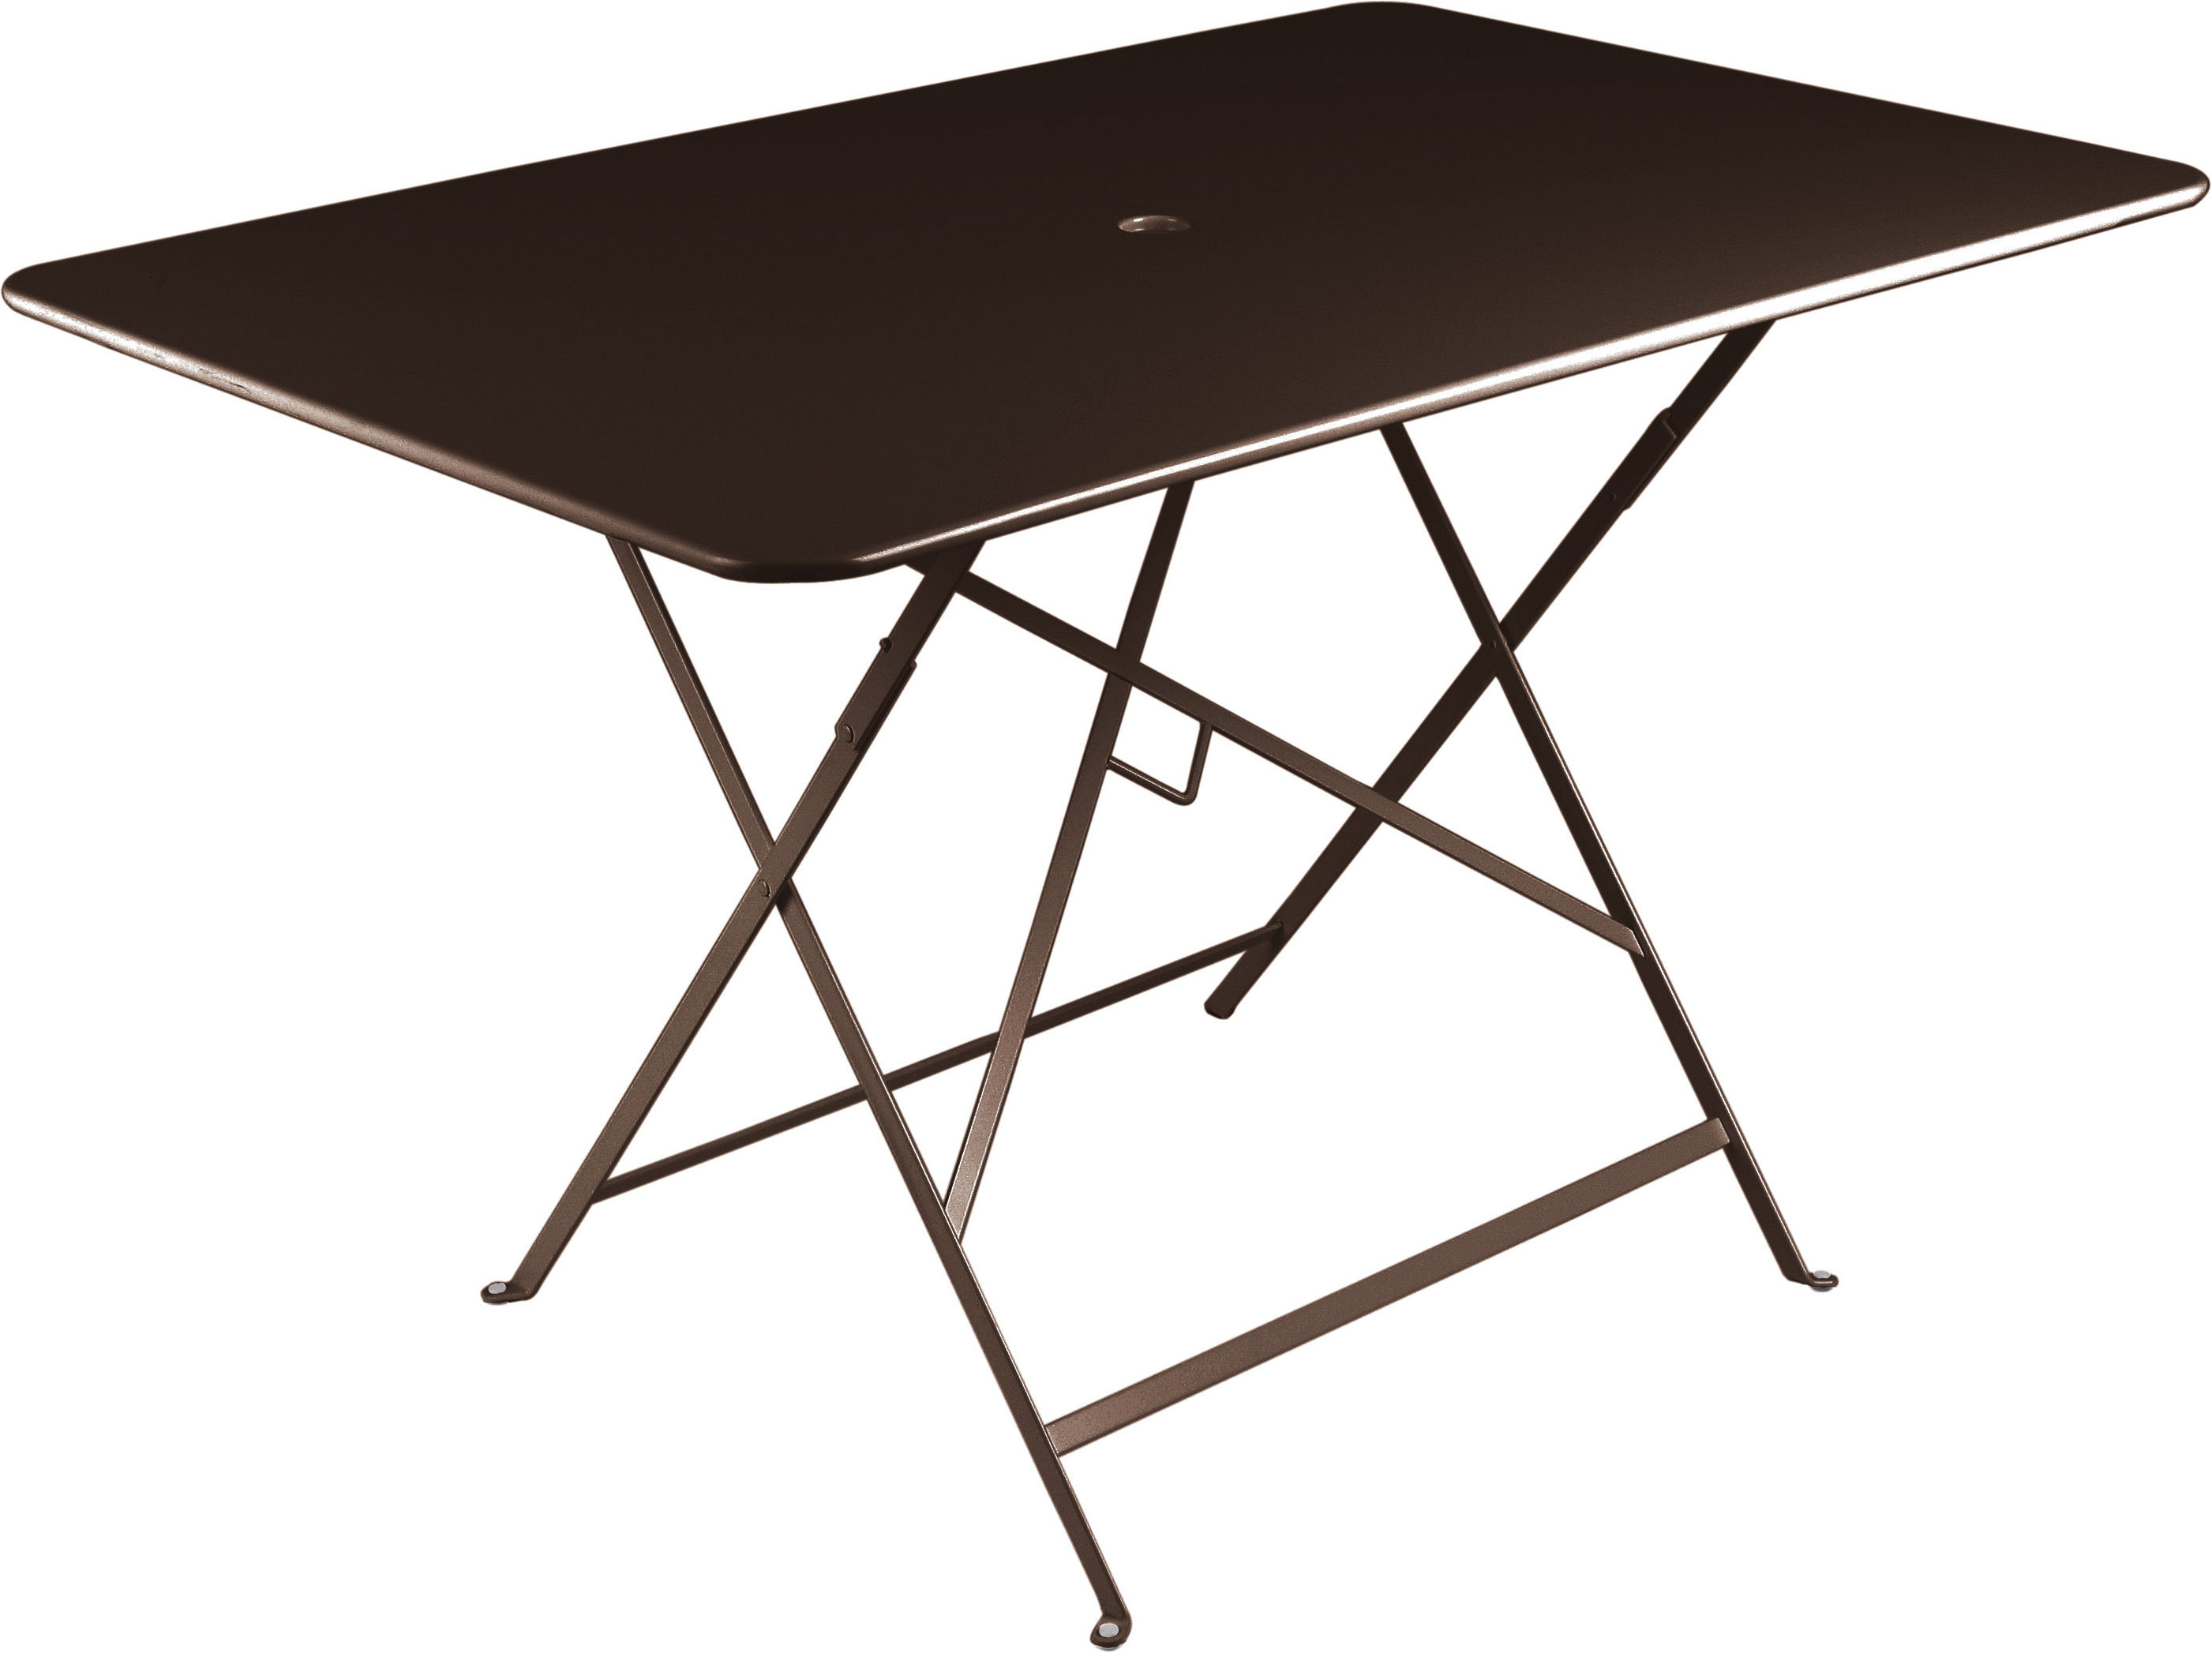 Outdoor - Tables de jardin - Table pliante Bistro / 117x77cm - 6 personnes - Fermob - Rouille - Acier laqué